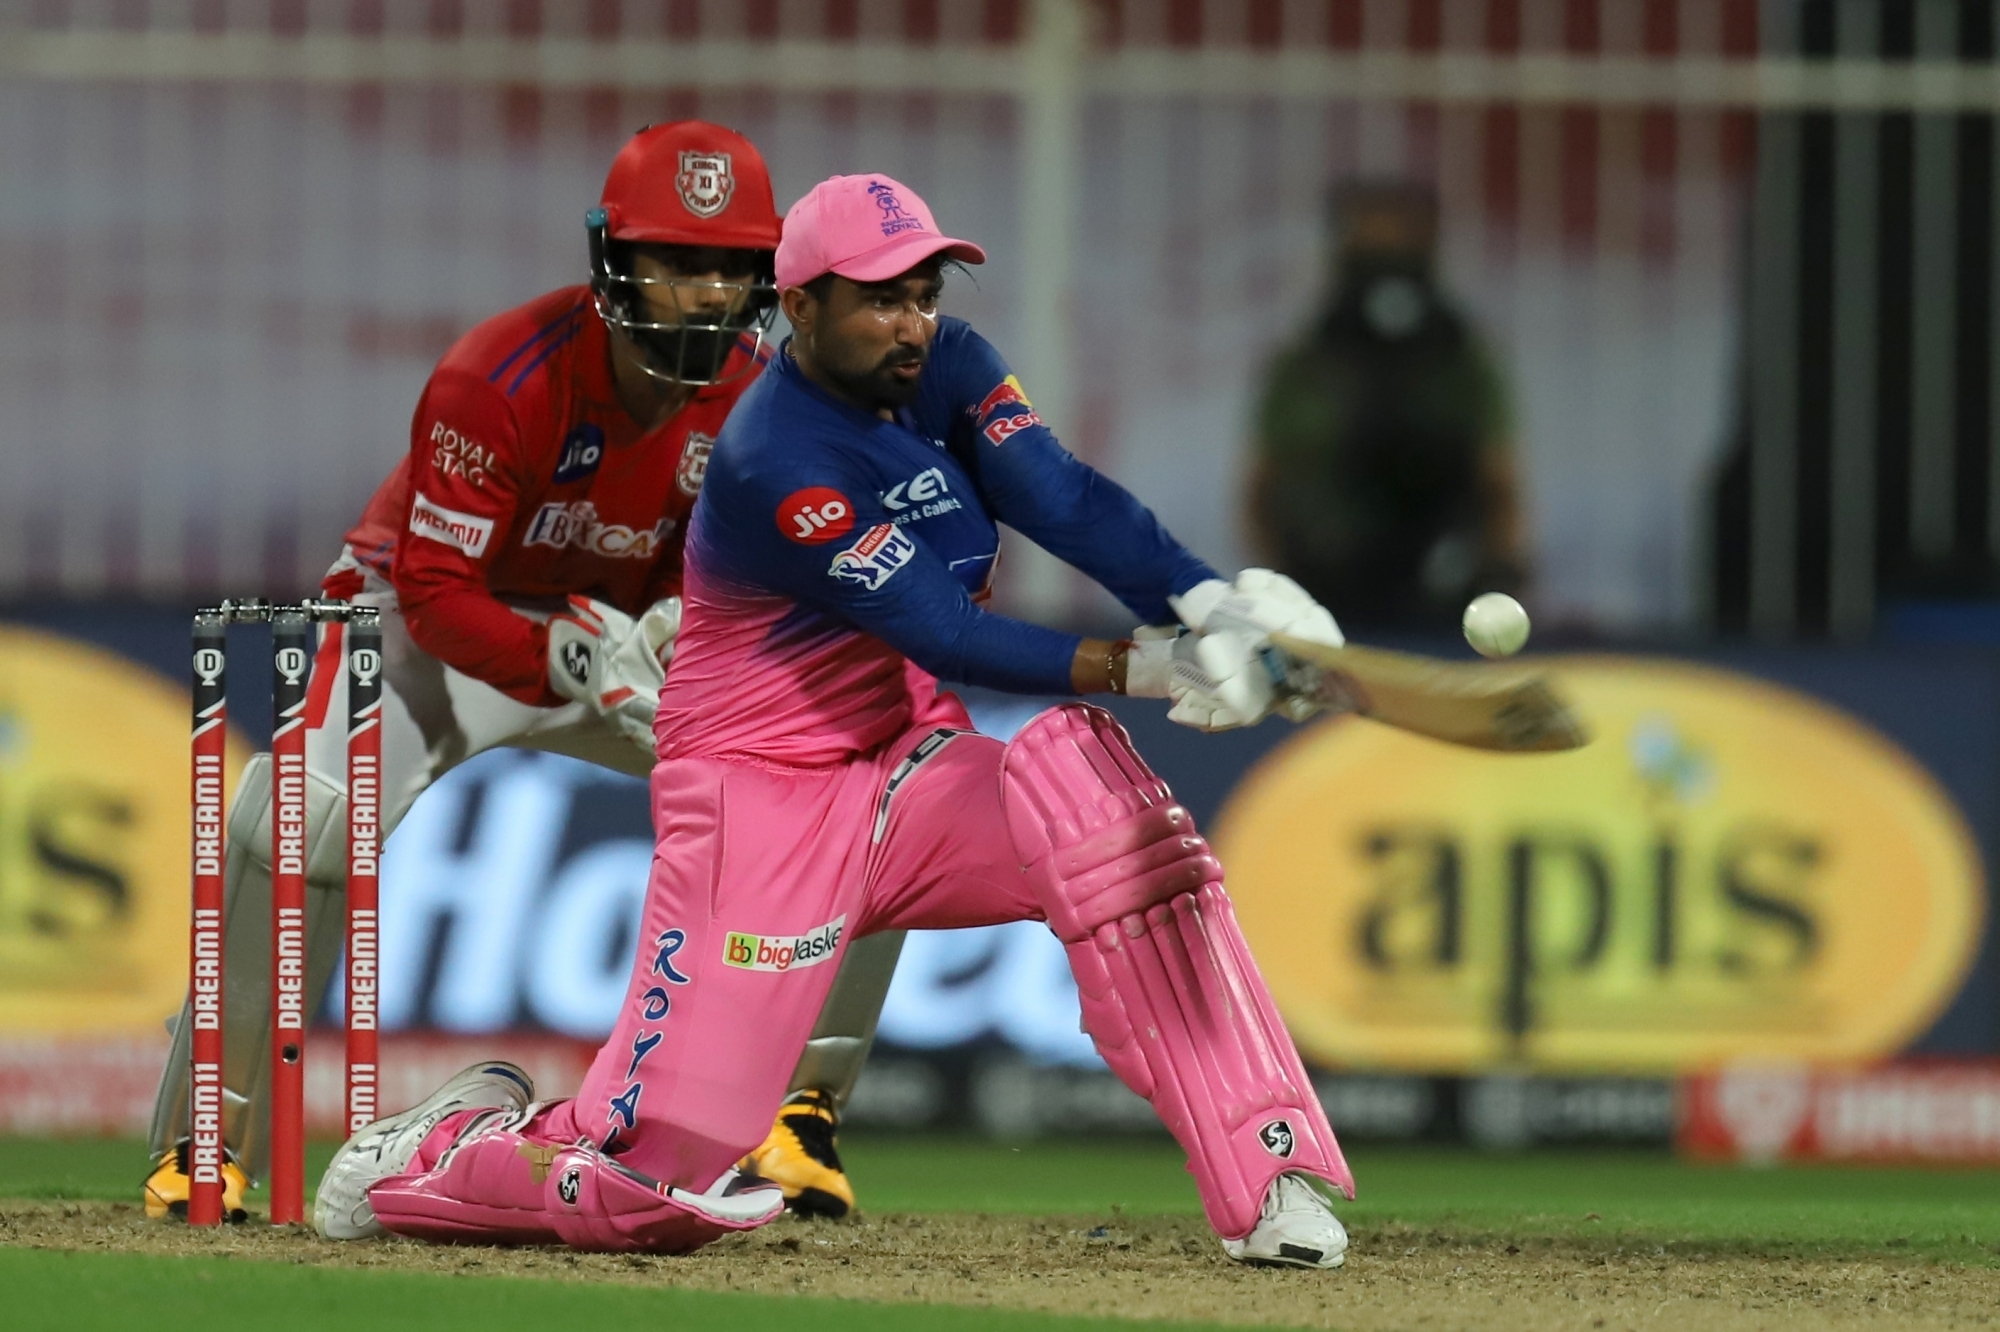 IPL 2020: Always knew he would get IPL stardom, says Rahul Tewatia's childhood coach